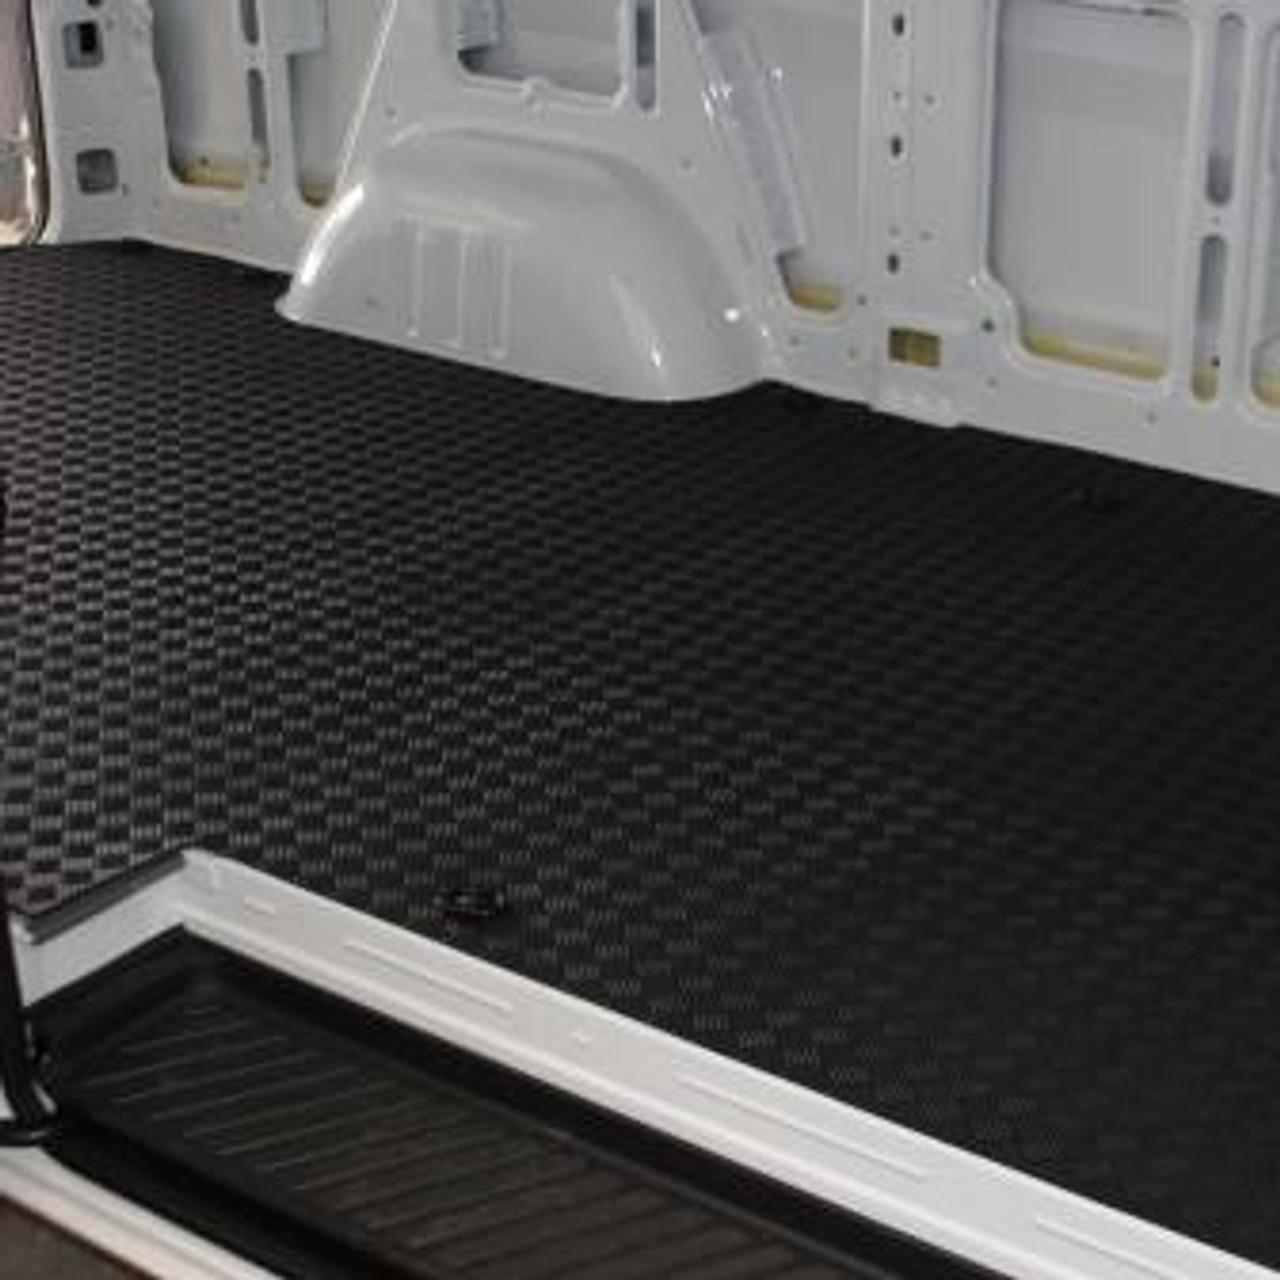 Mercedes Sprinter Van Rubber Floor Mat Advantage Outfitters